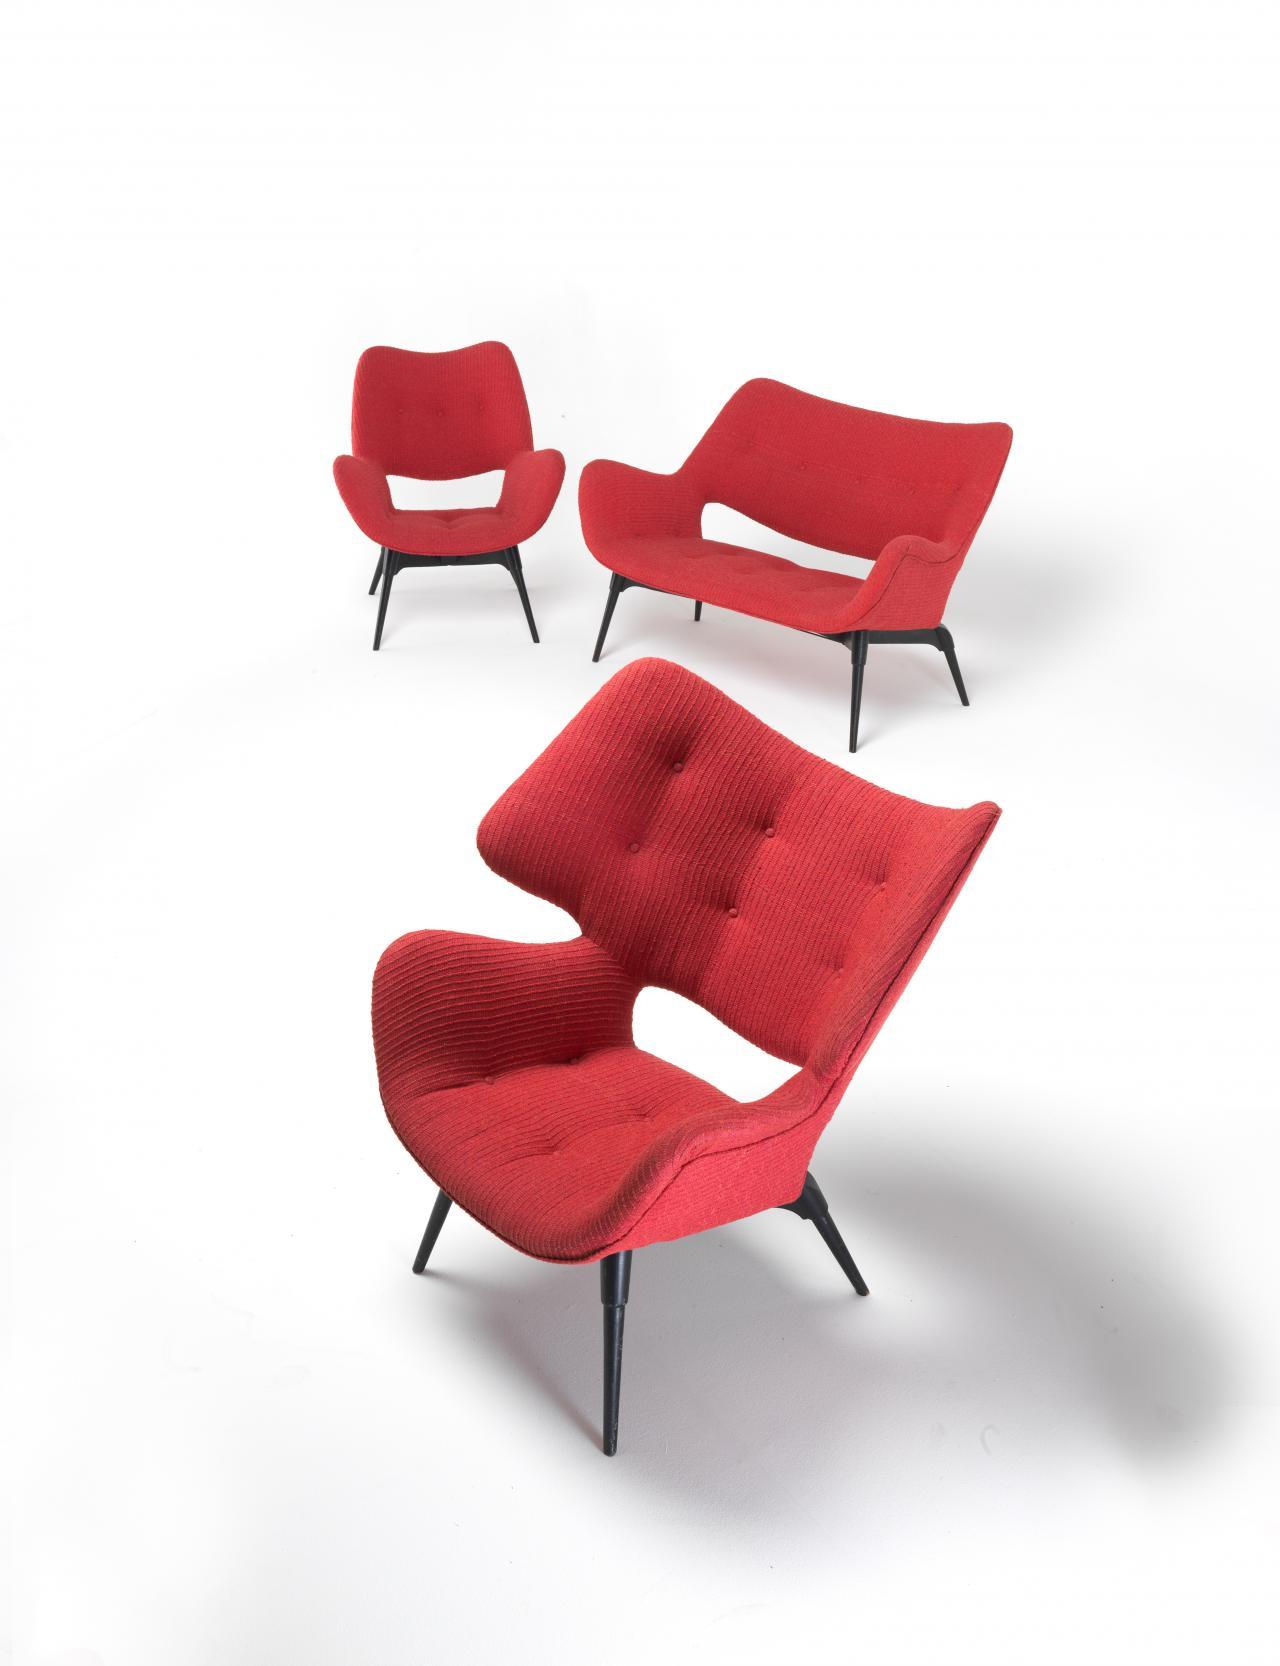 Image of: Mid Century Modern Australian Furniture Design Ngv